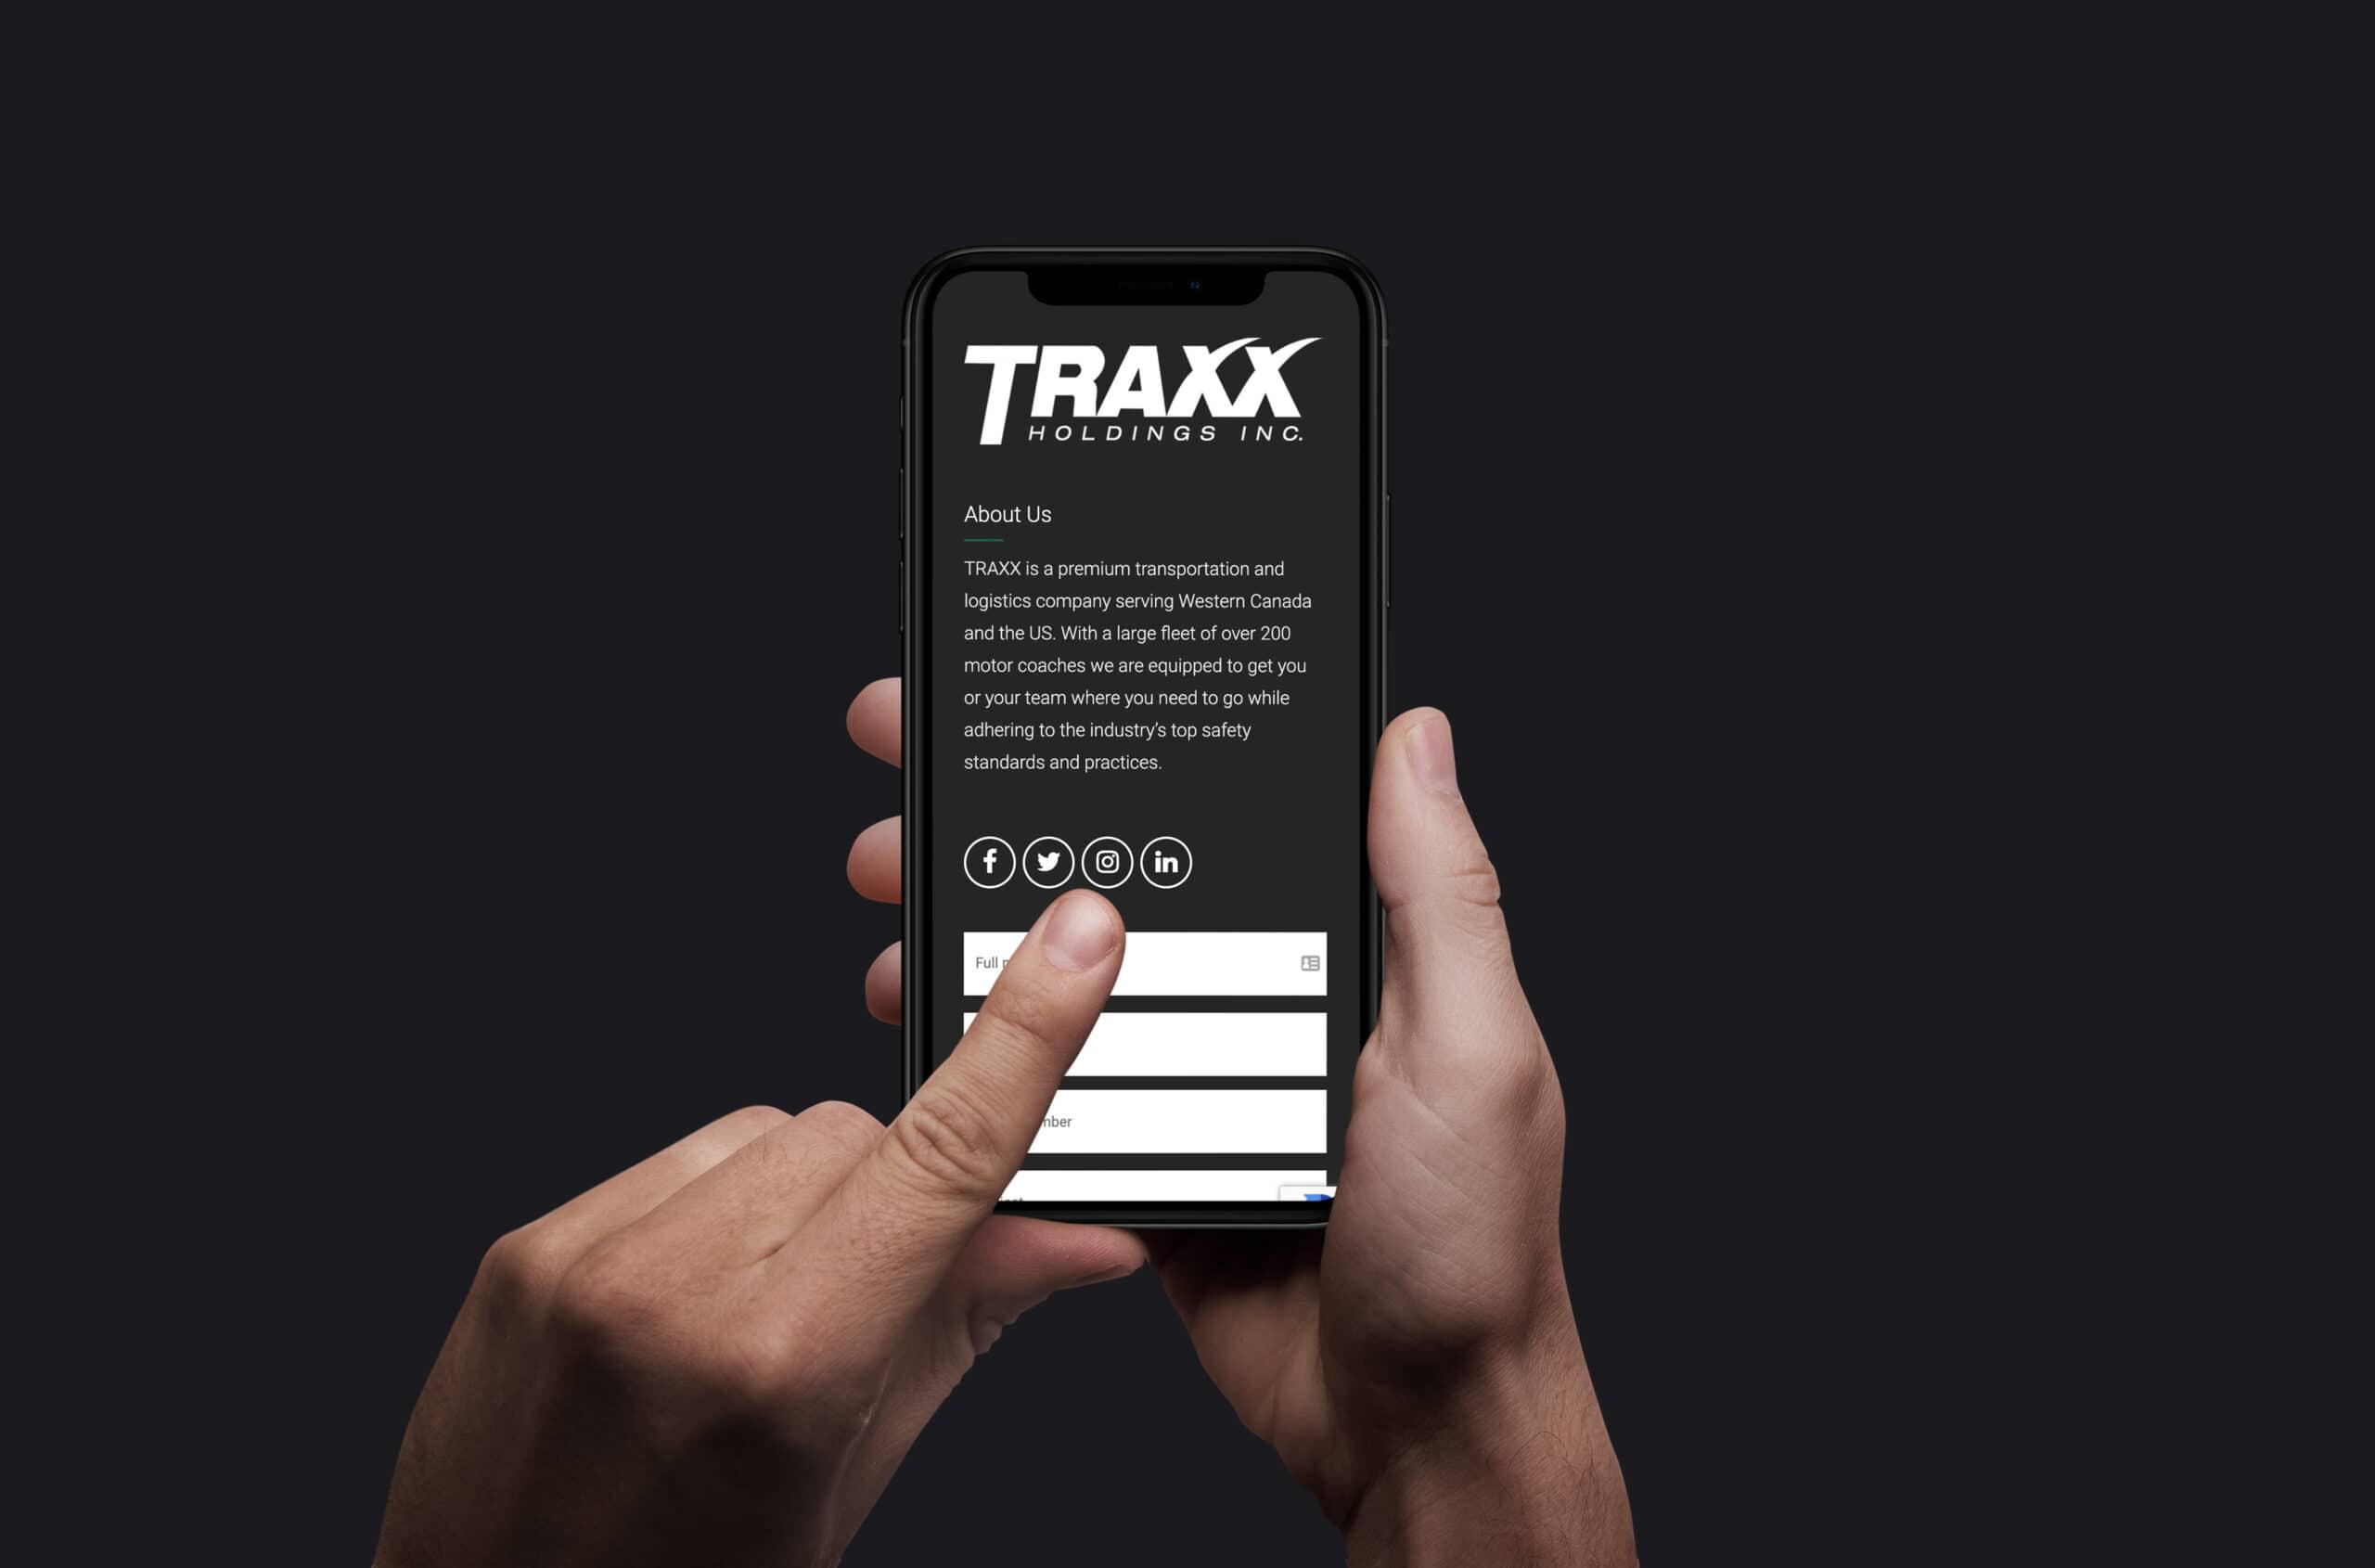 TRAXX Holdings